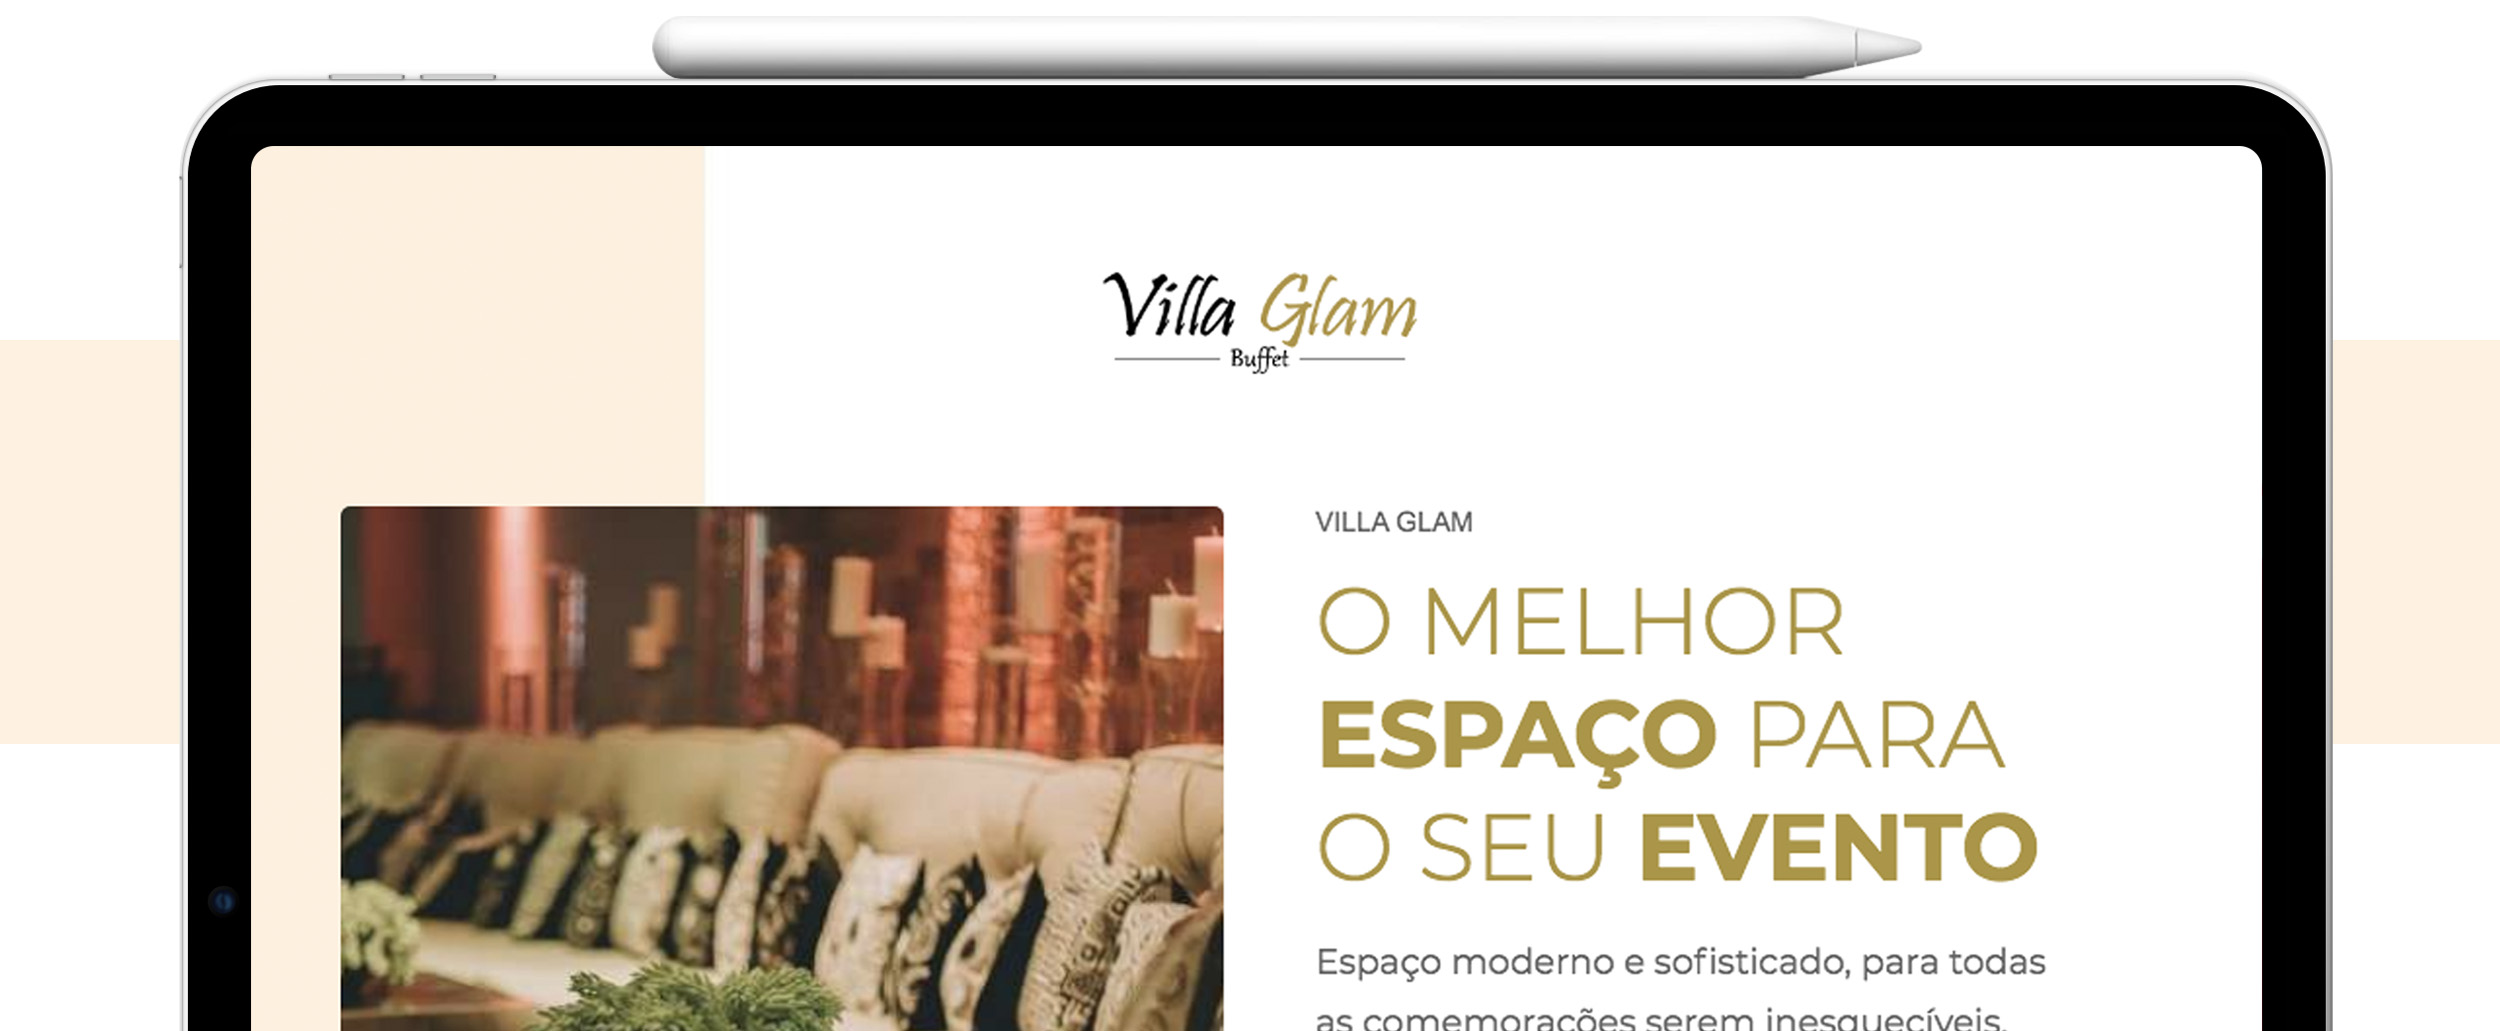 <p><span>Villa Glam</span></p>